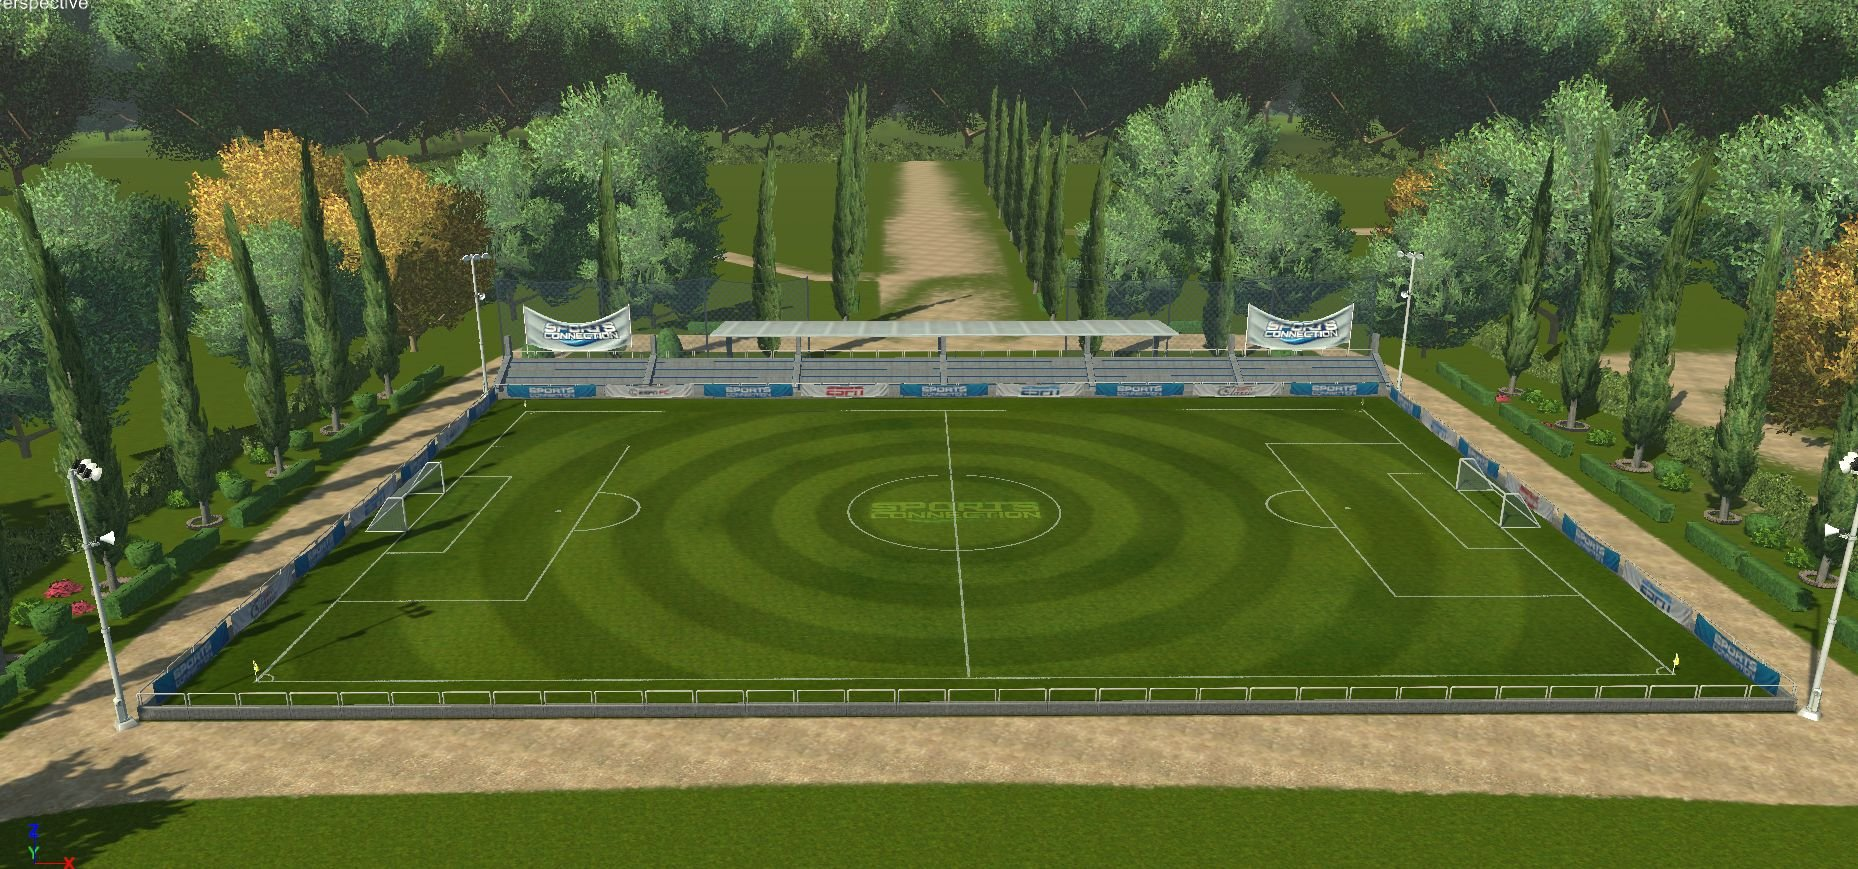 Pere balsach sc soccer 03 02